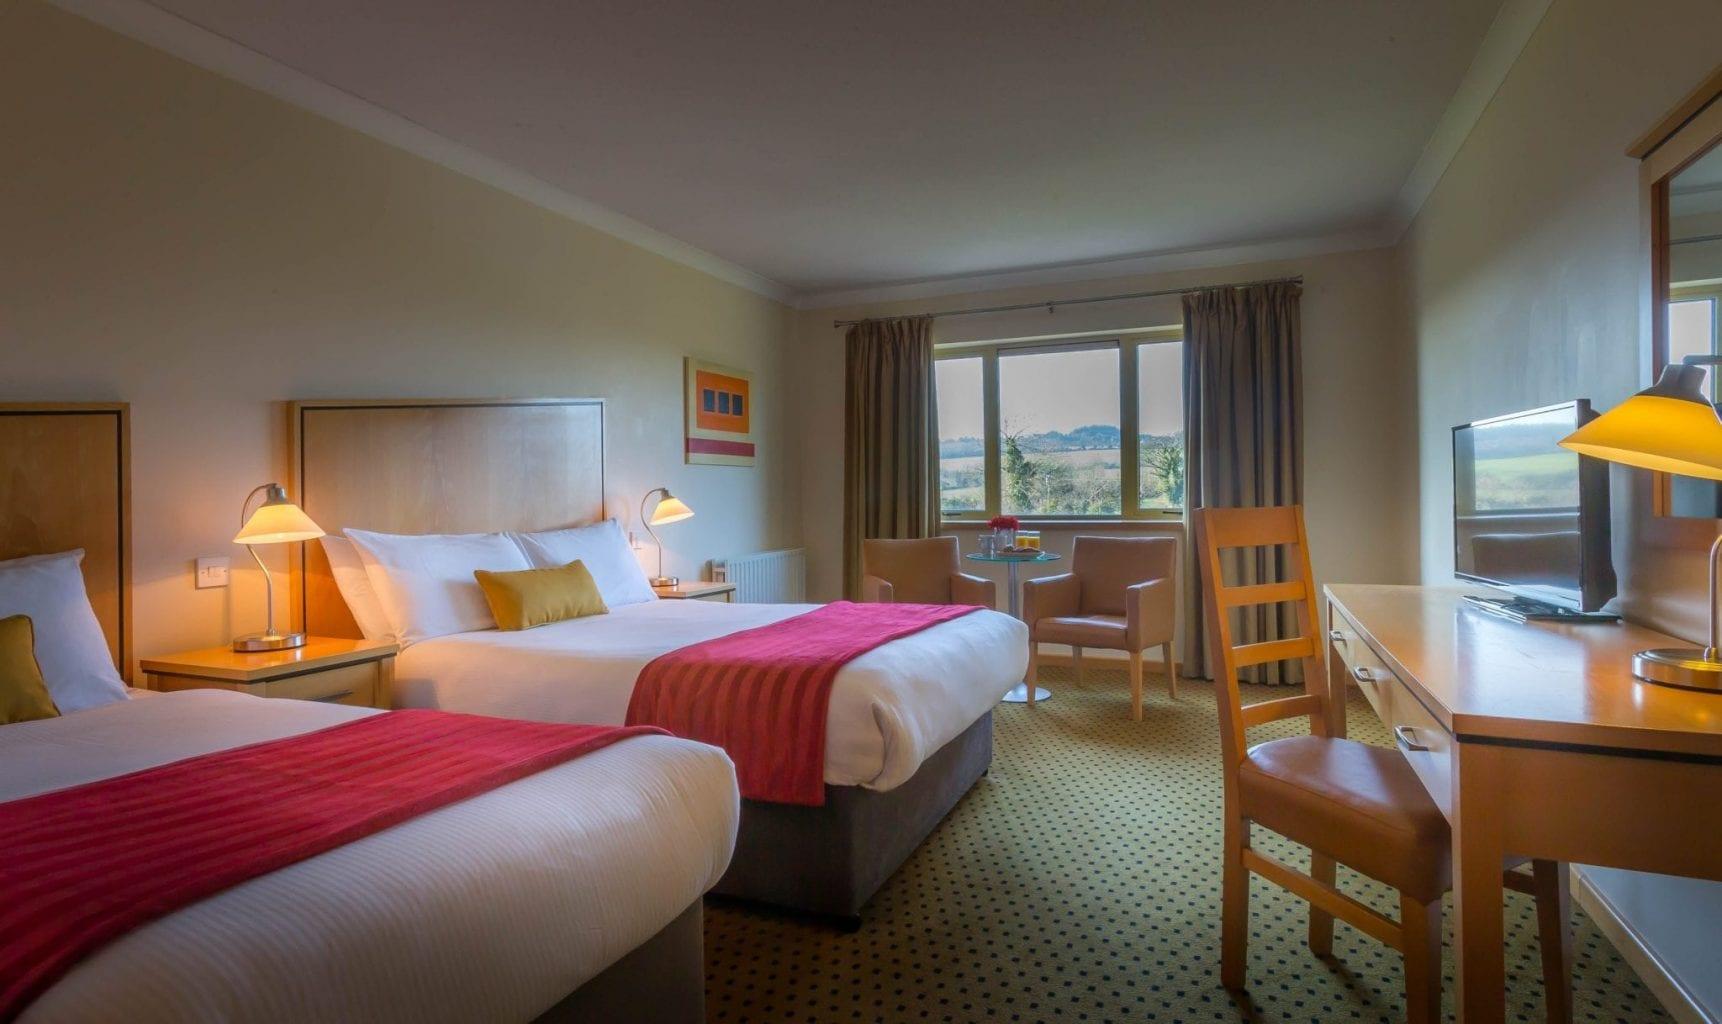 Maldron Hotel Wexford spacious Twin room